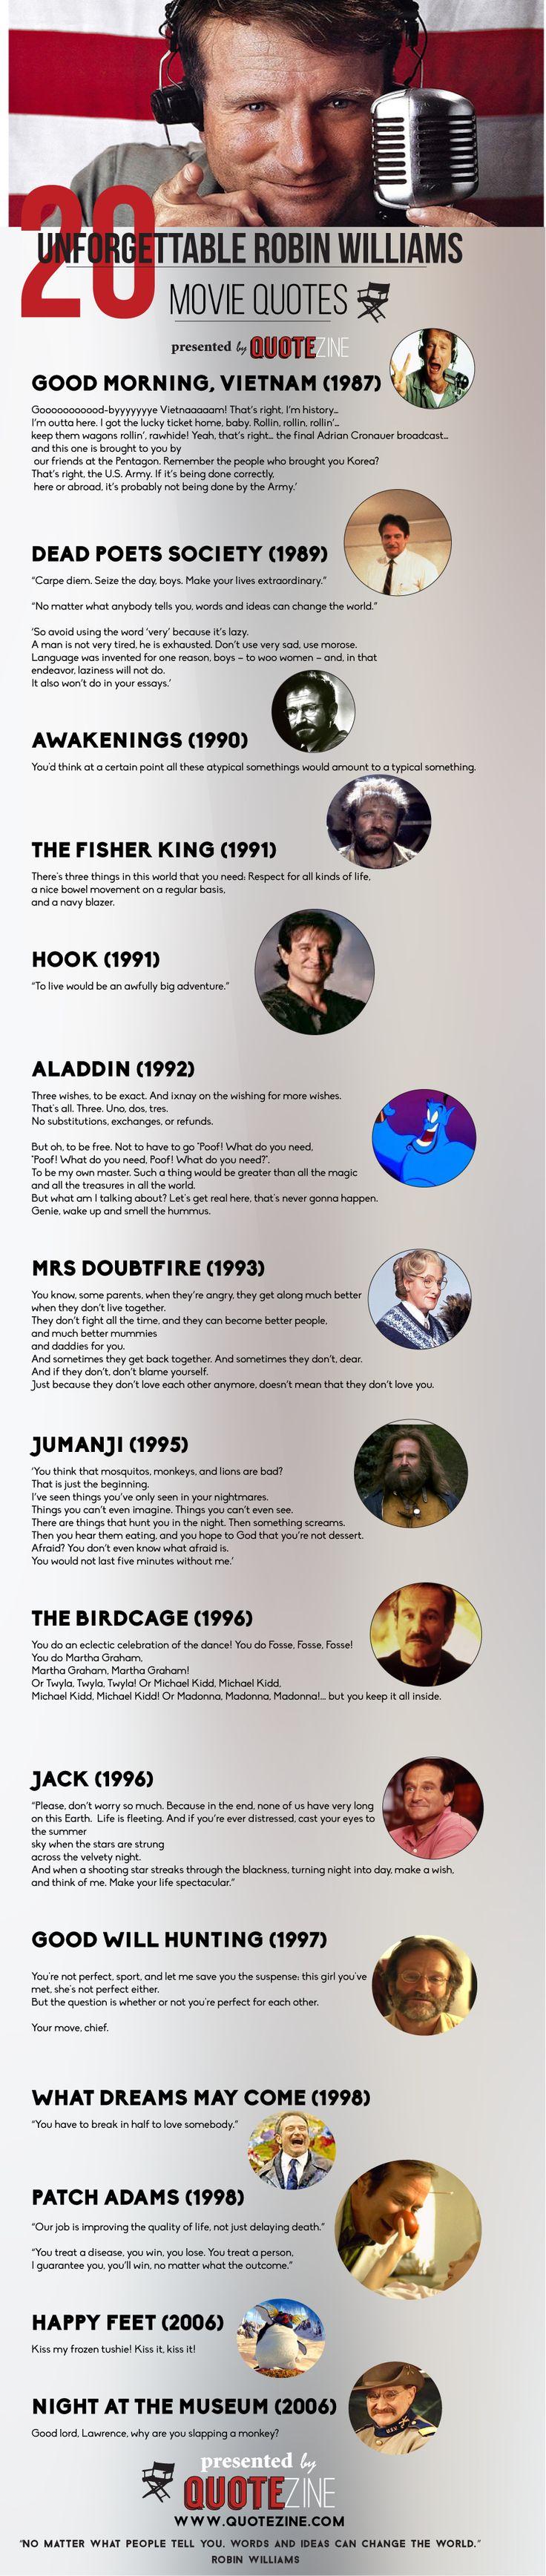 "alt=""robin williams quotes infographic"""